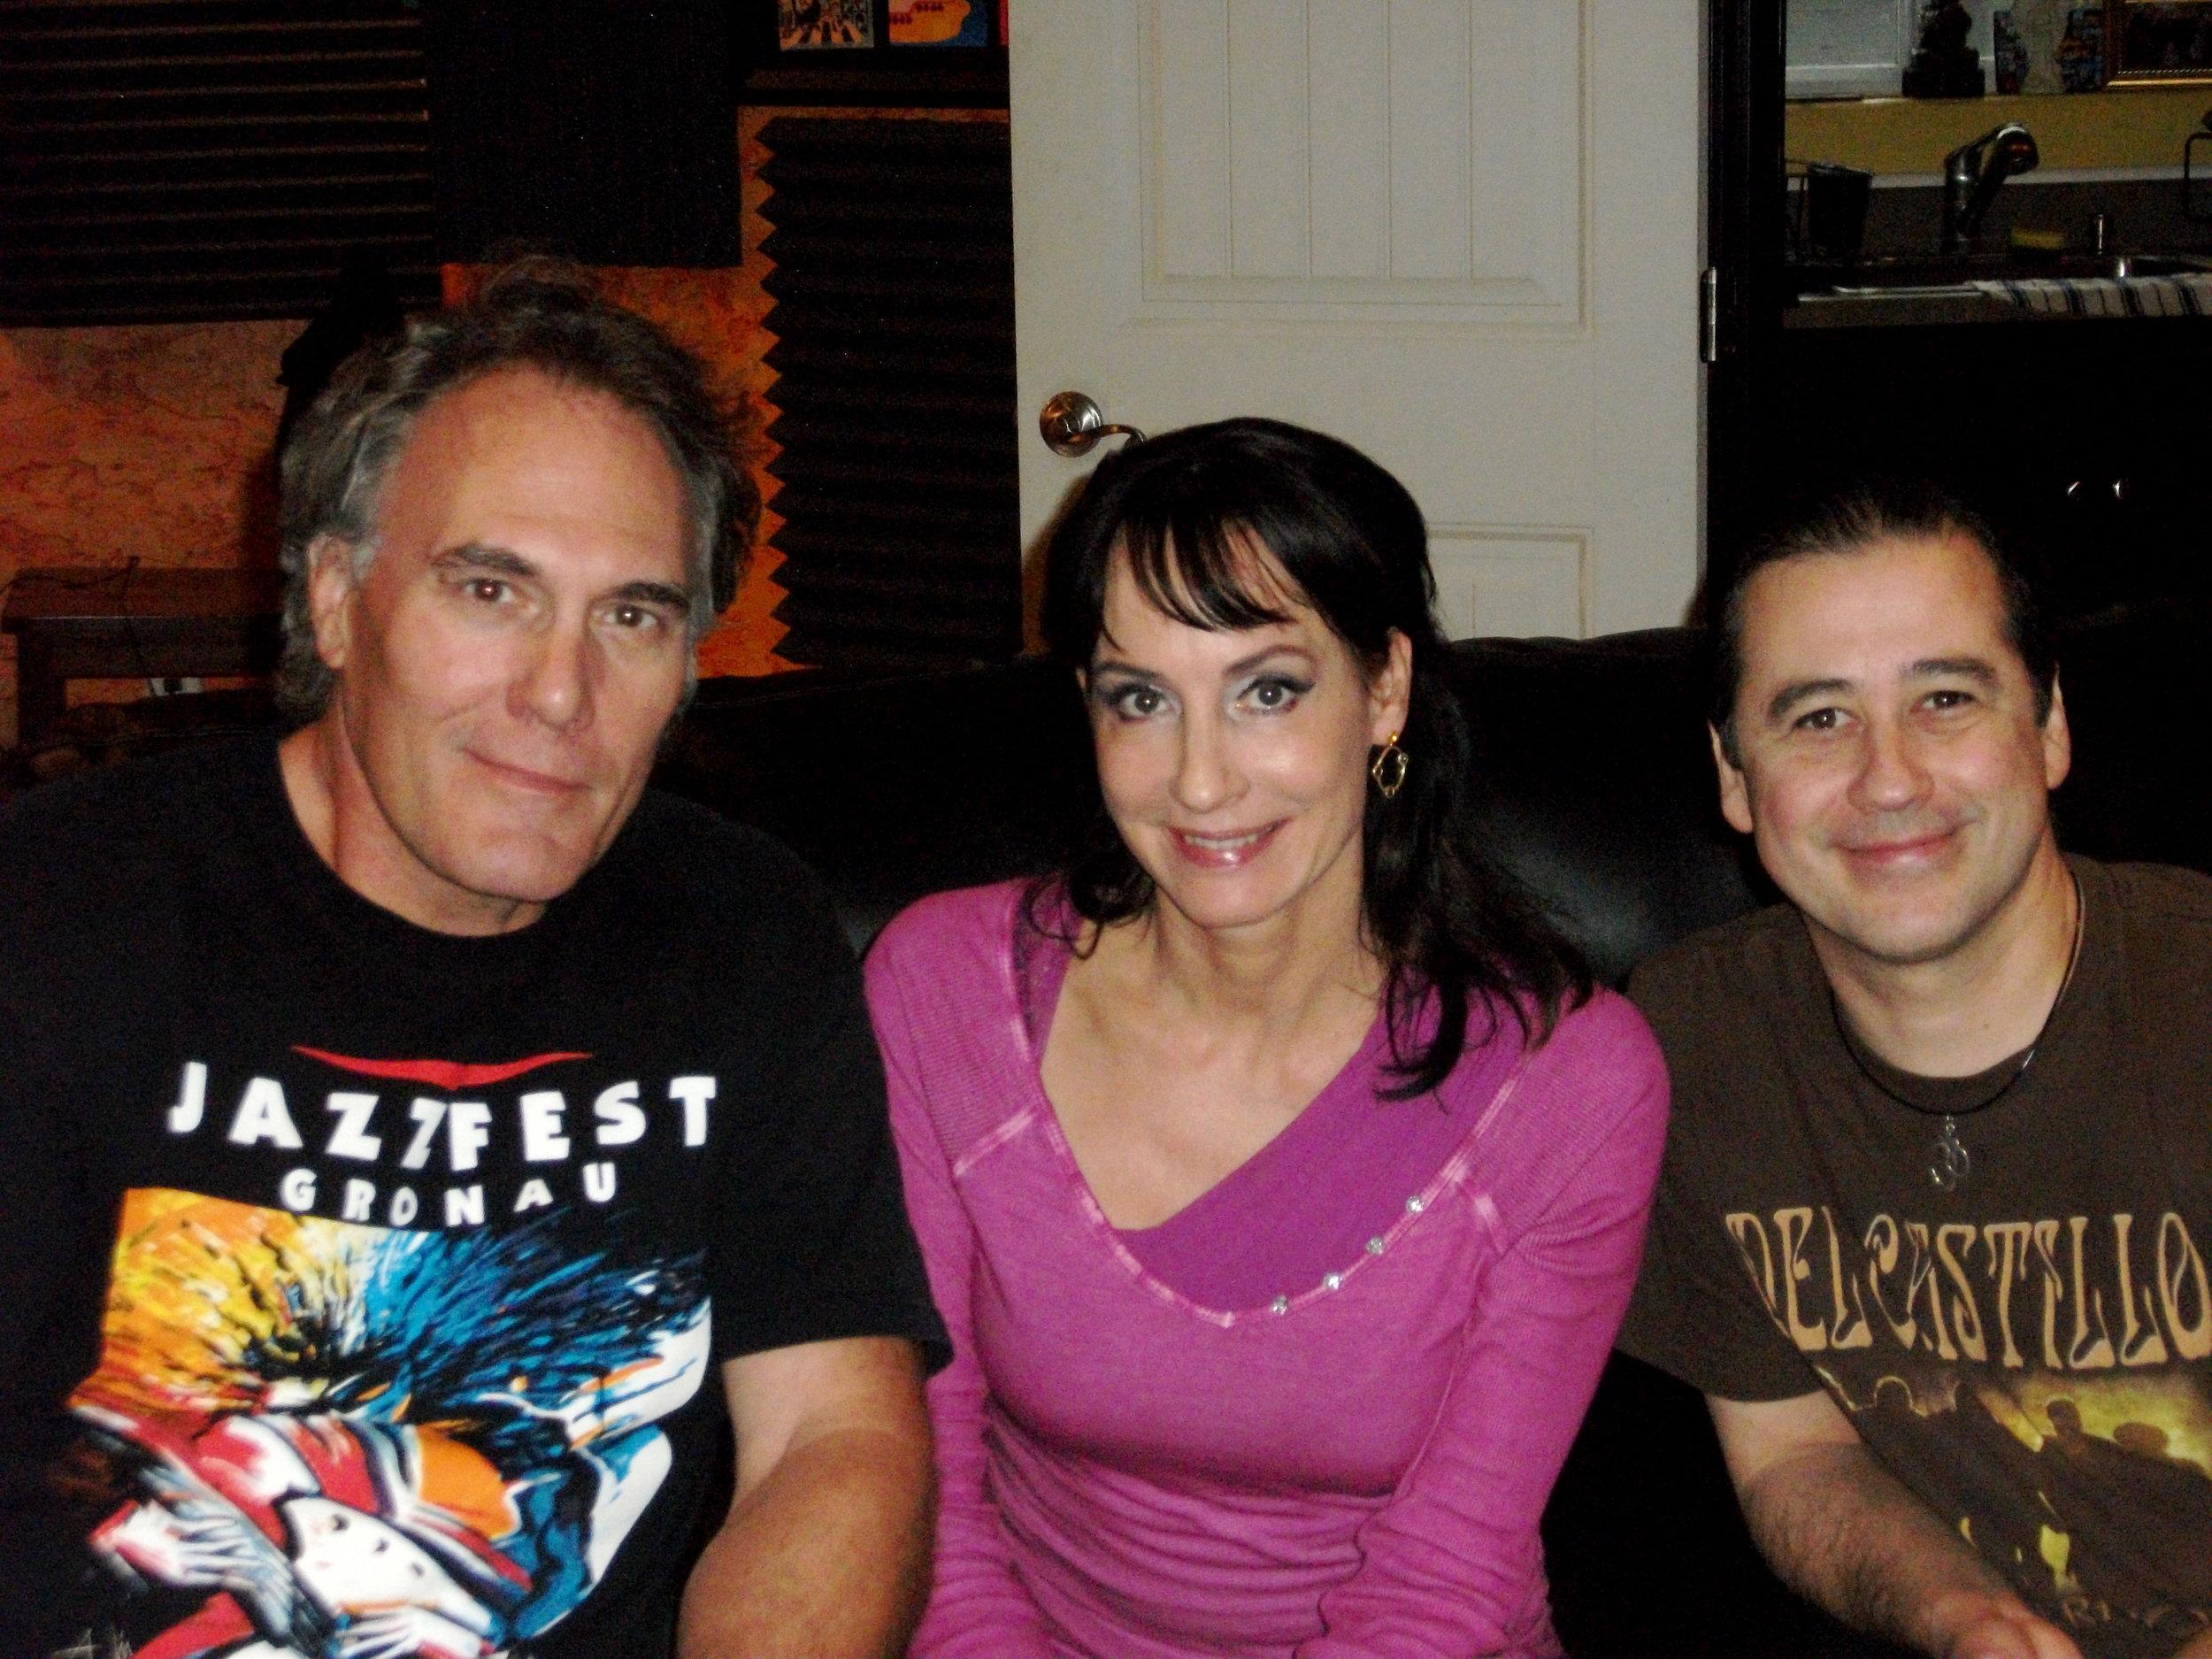 (LtoR Co-Producer Preston Sullivan, Co-Producer- Recording Artist Anna Maria Kaufmann and Co-Producer Rick del Castillo in Kyle, TX Smilin' Castle Recording Studios.JPG